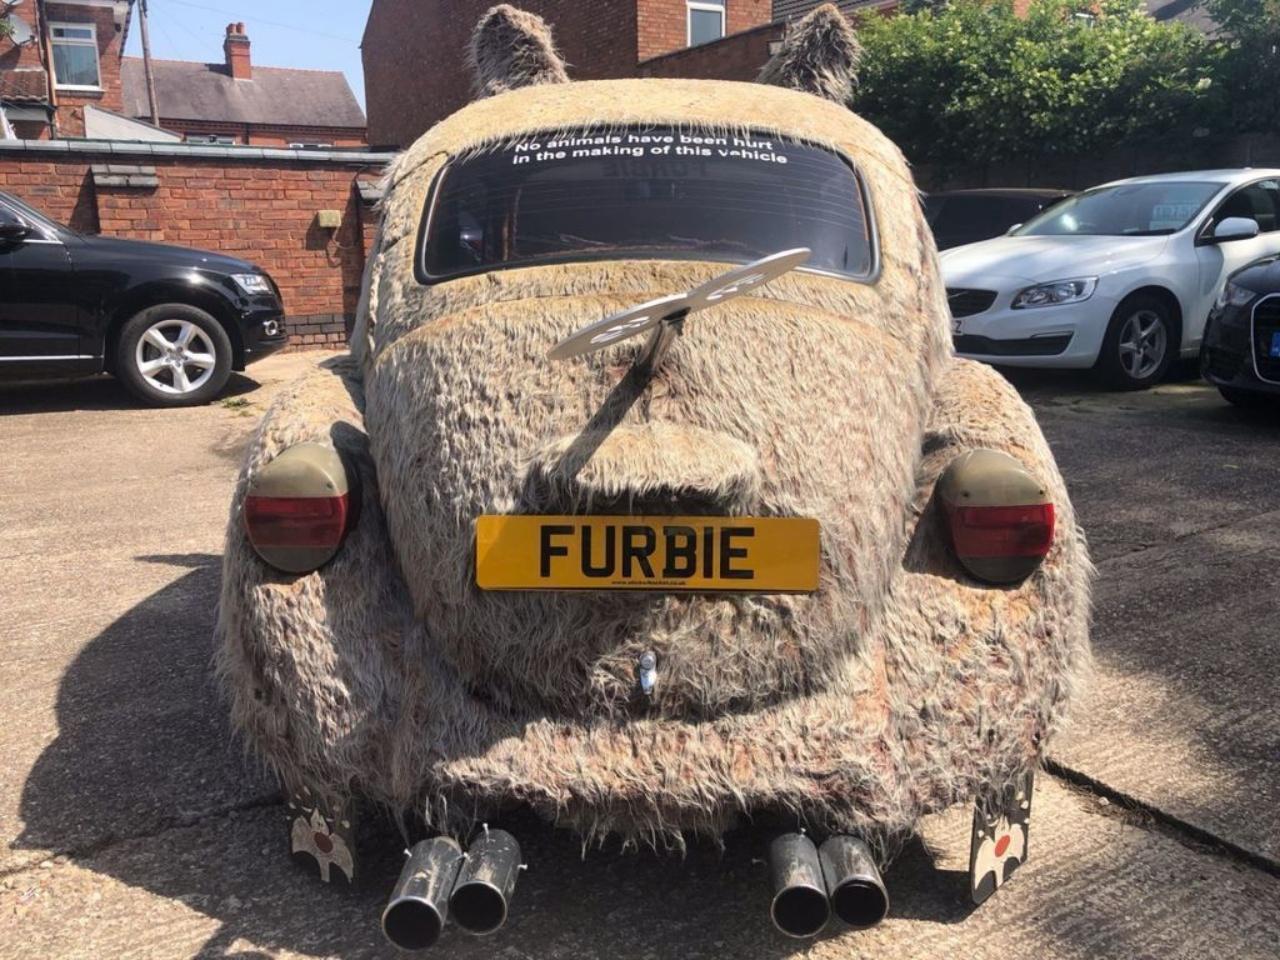 Volkswagen-Beetle-Furbie-1978-8